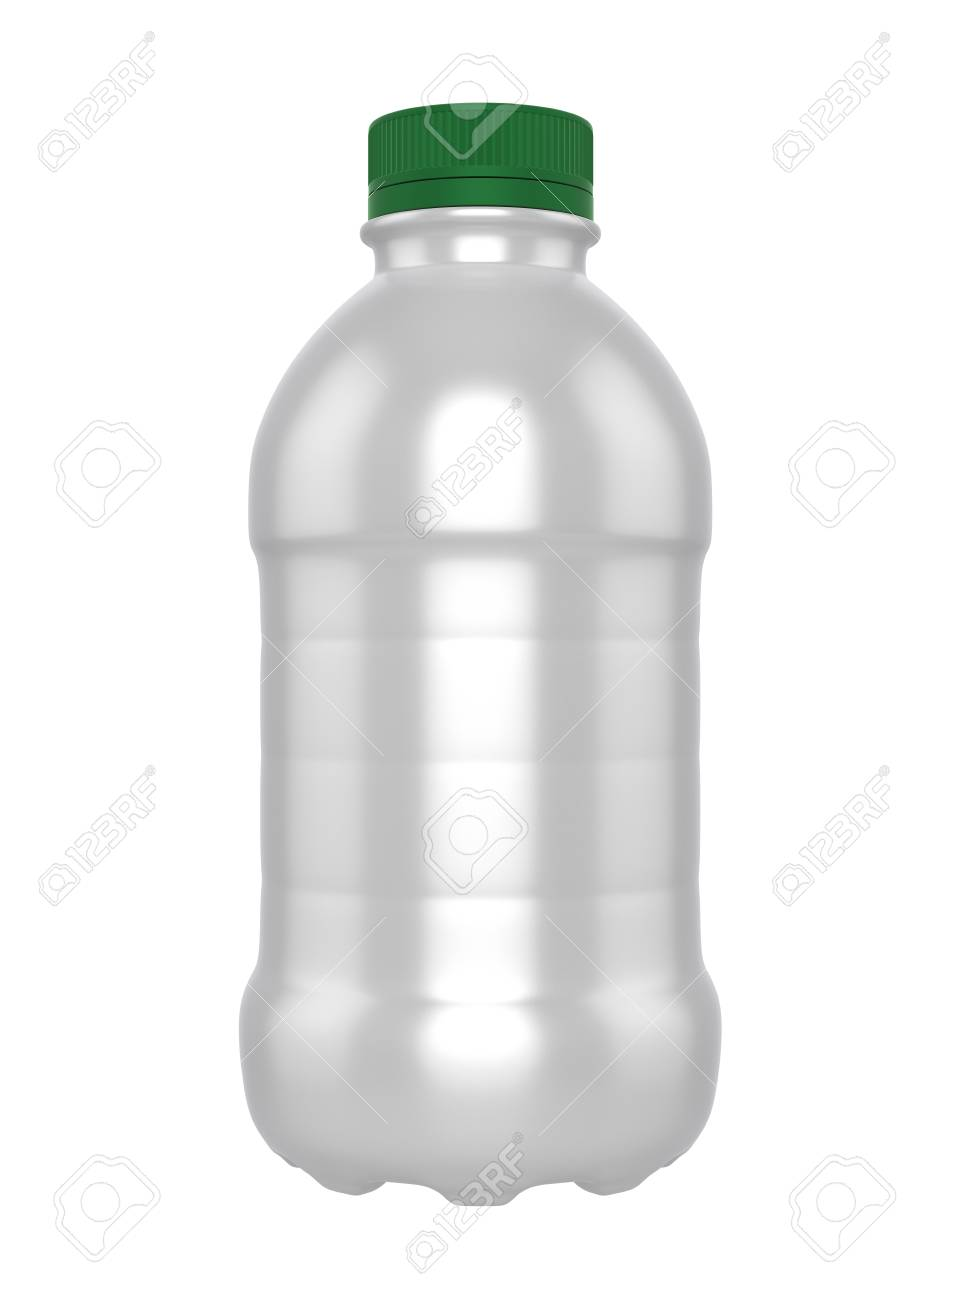 3d realistic render of template plastic bottle of milk green lid